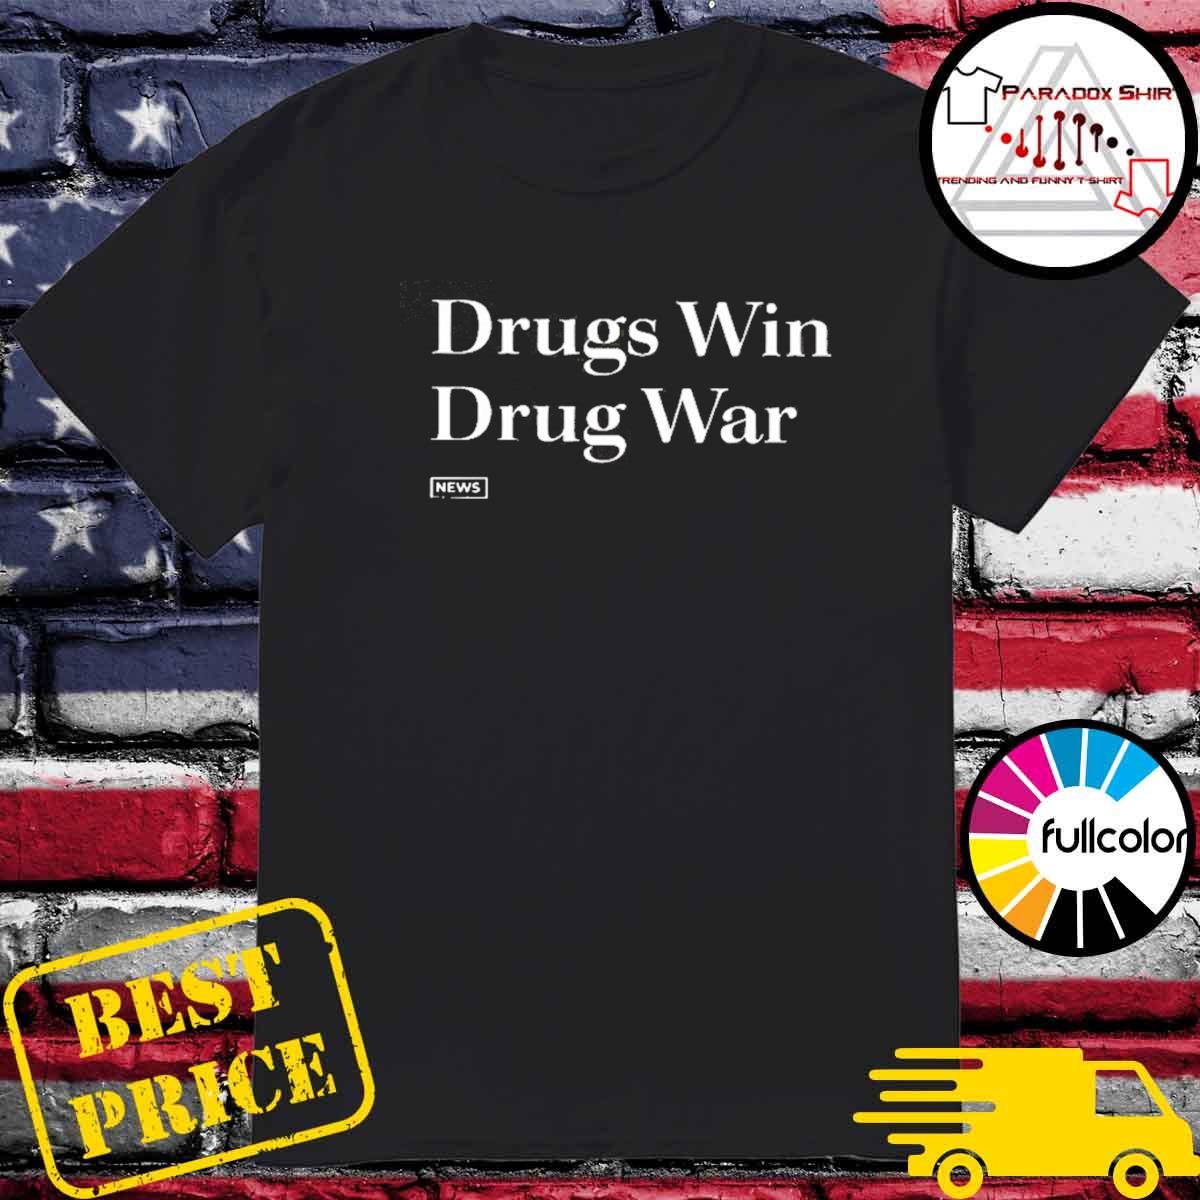 Drugs win drug war news shirt